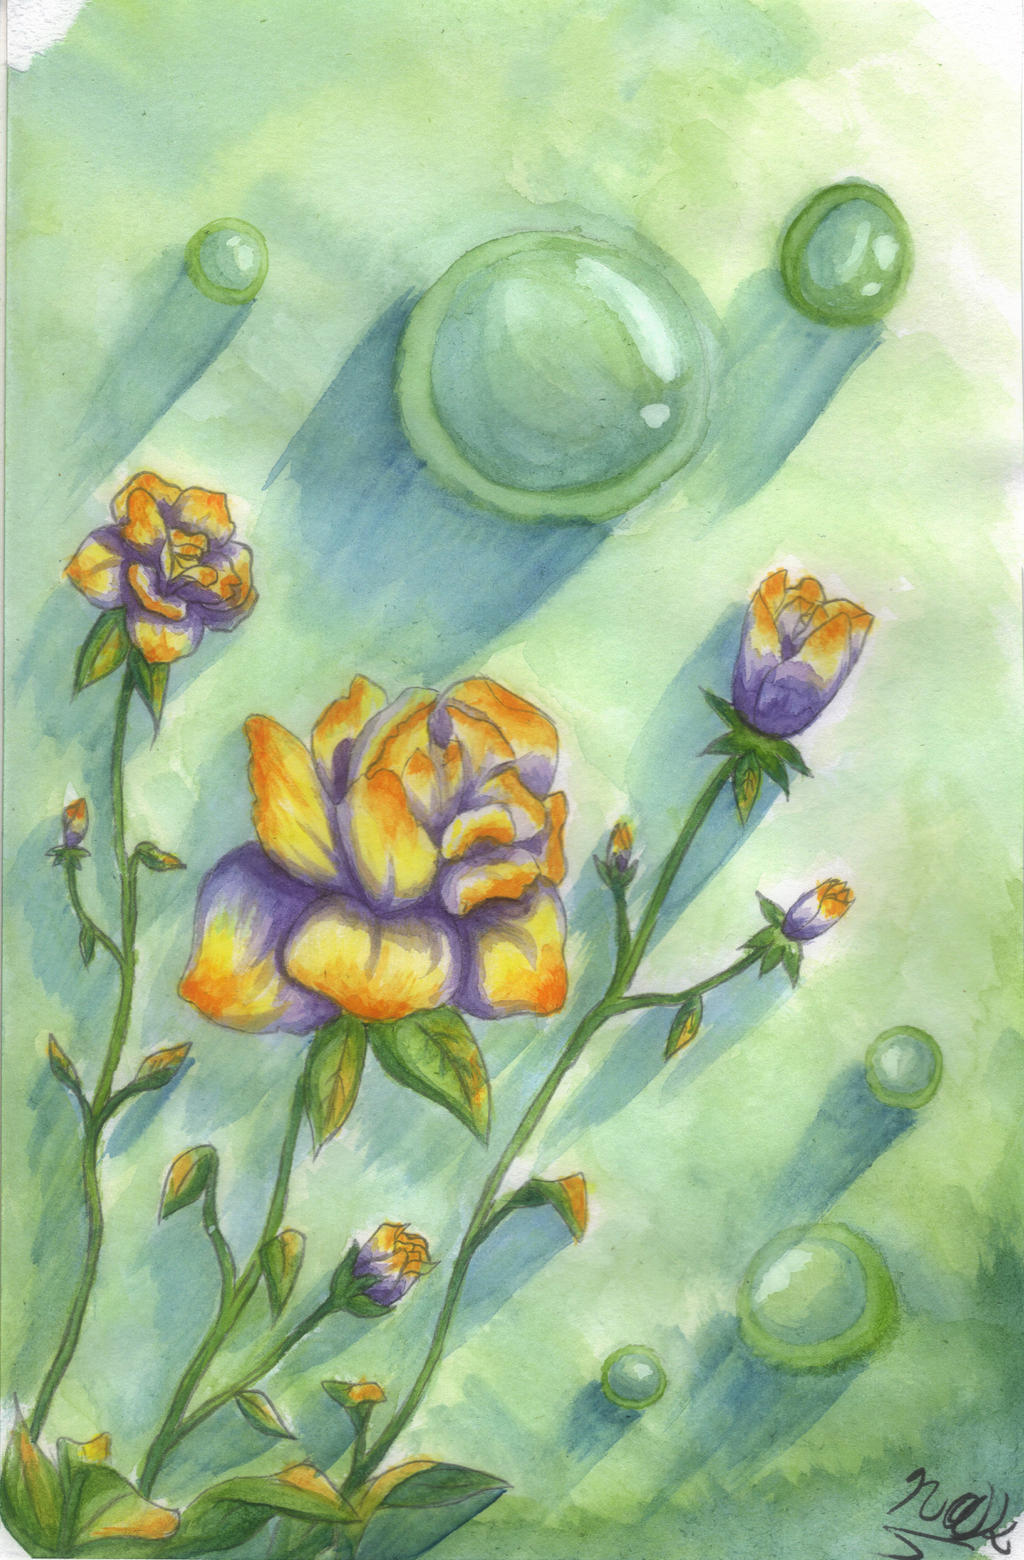 Watercolors#2 Flowers n Bubbles Gimp EDIT by Naks-Ark